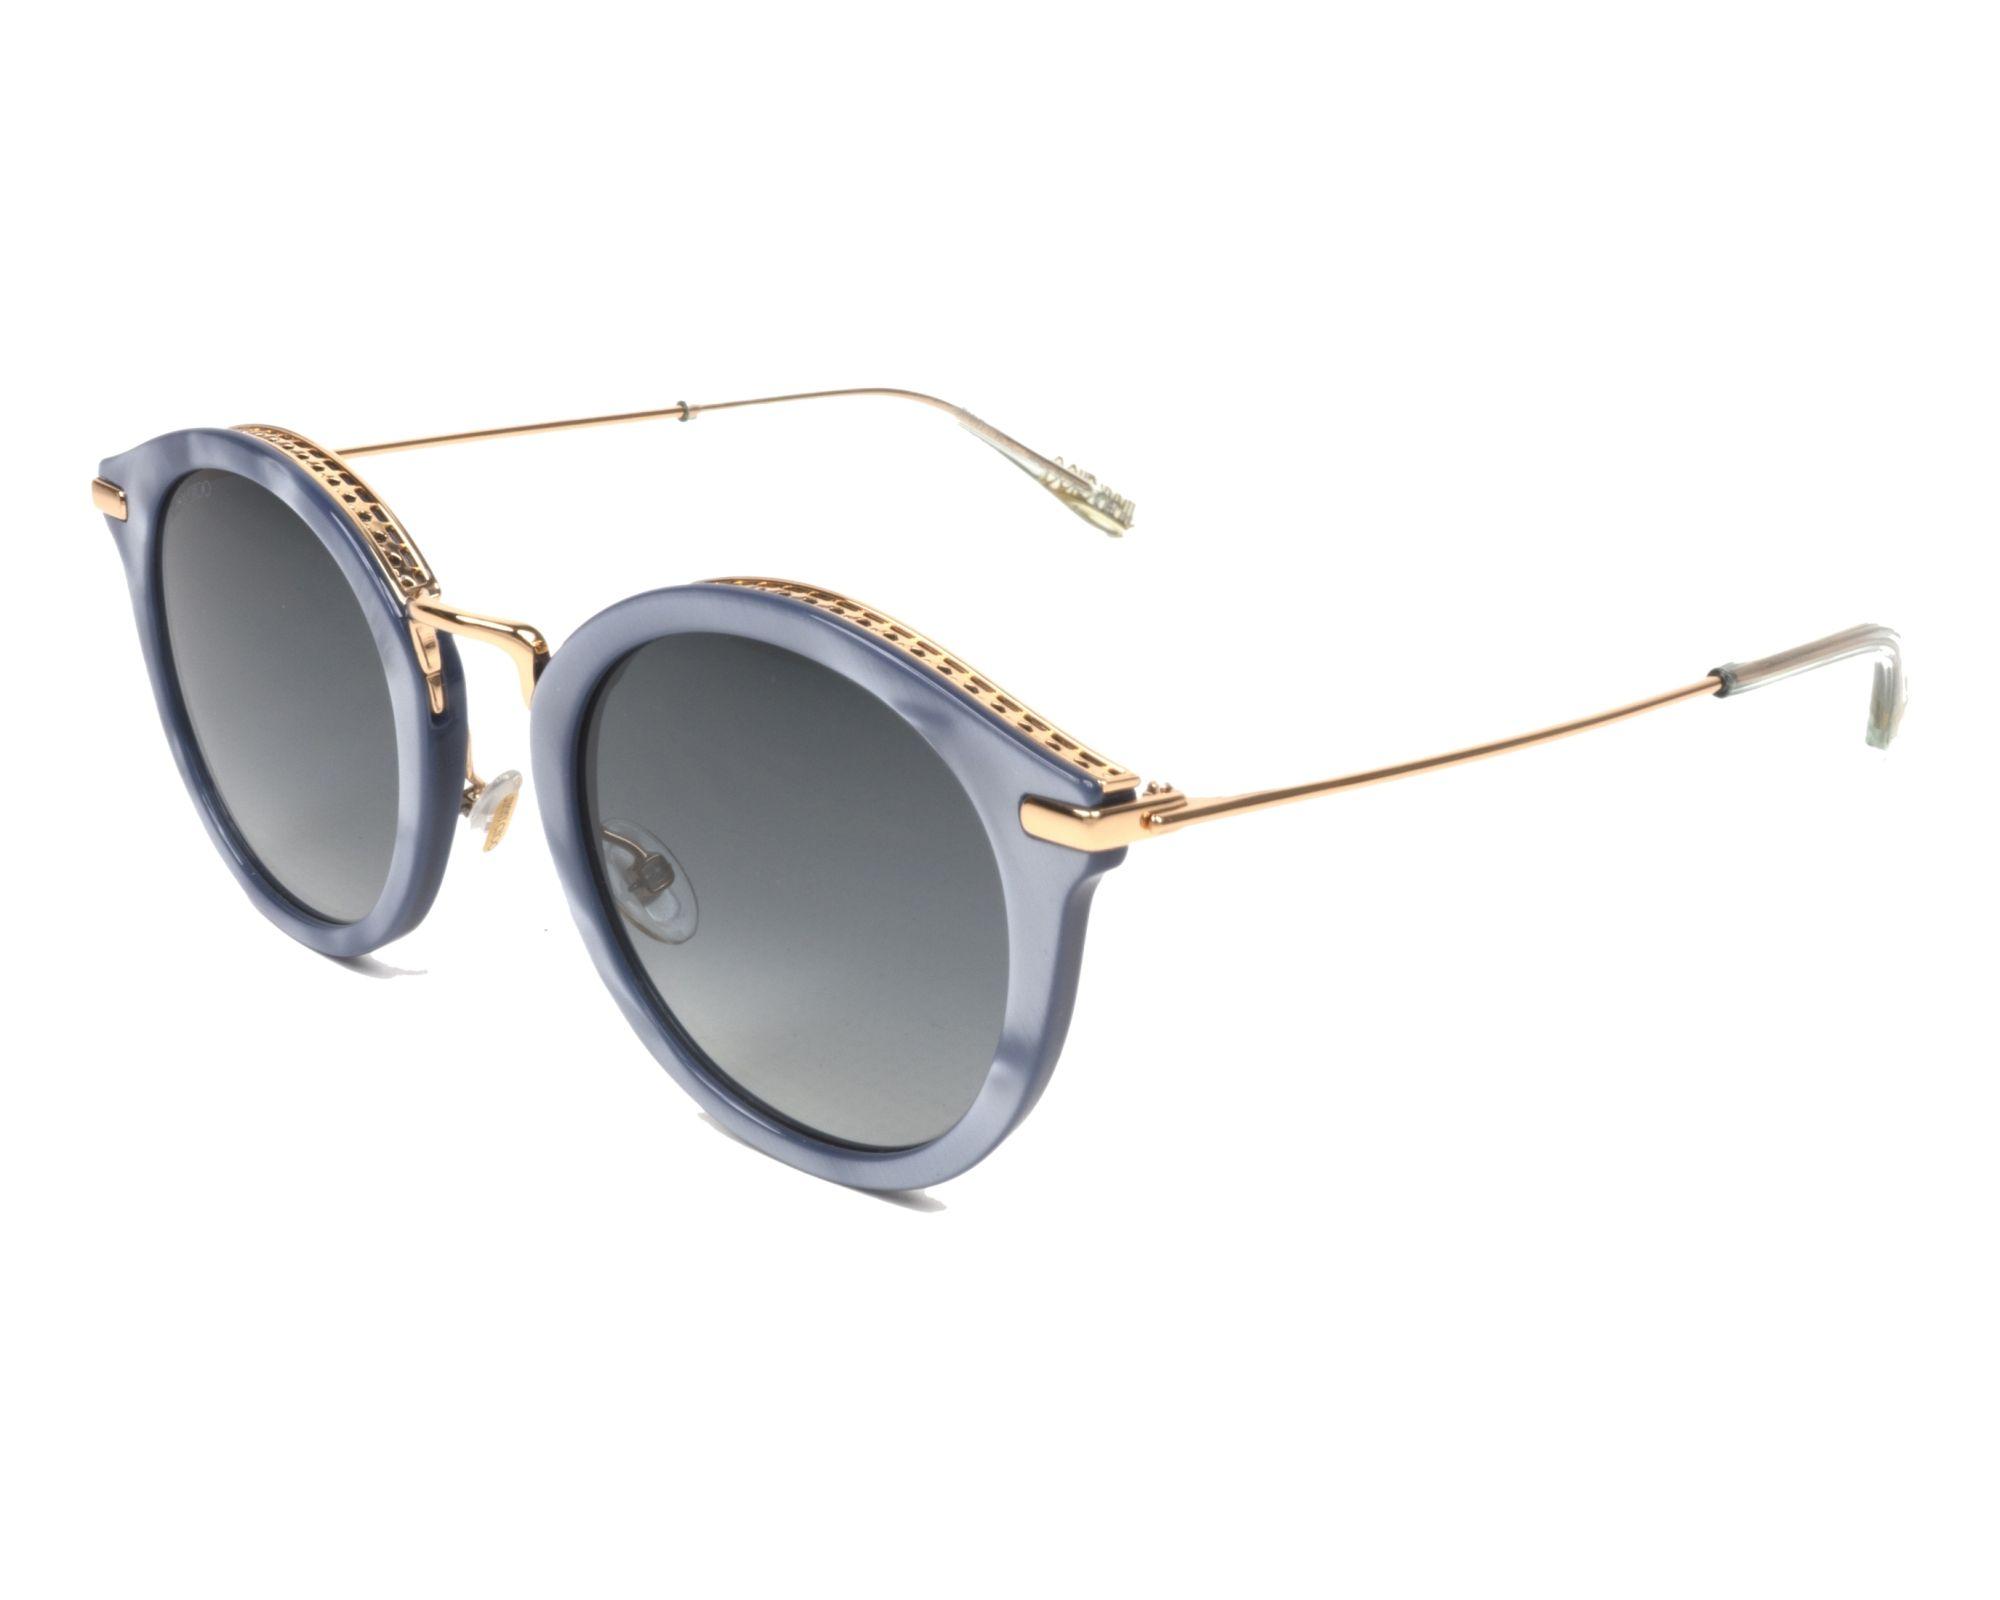 Jimmy Choo Sunglasses Grey with Blue Grey Lenses BOBBY-S JAG/9O ...